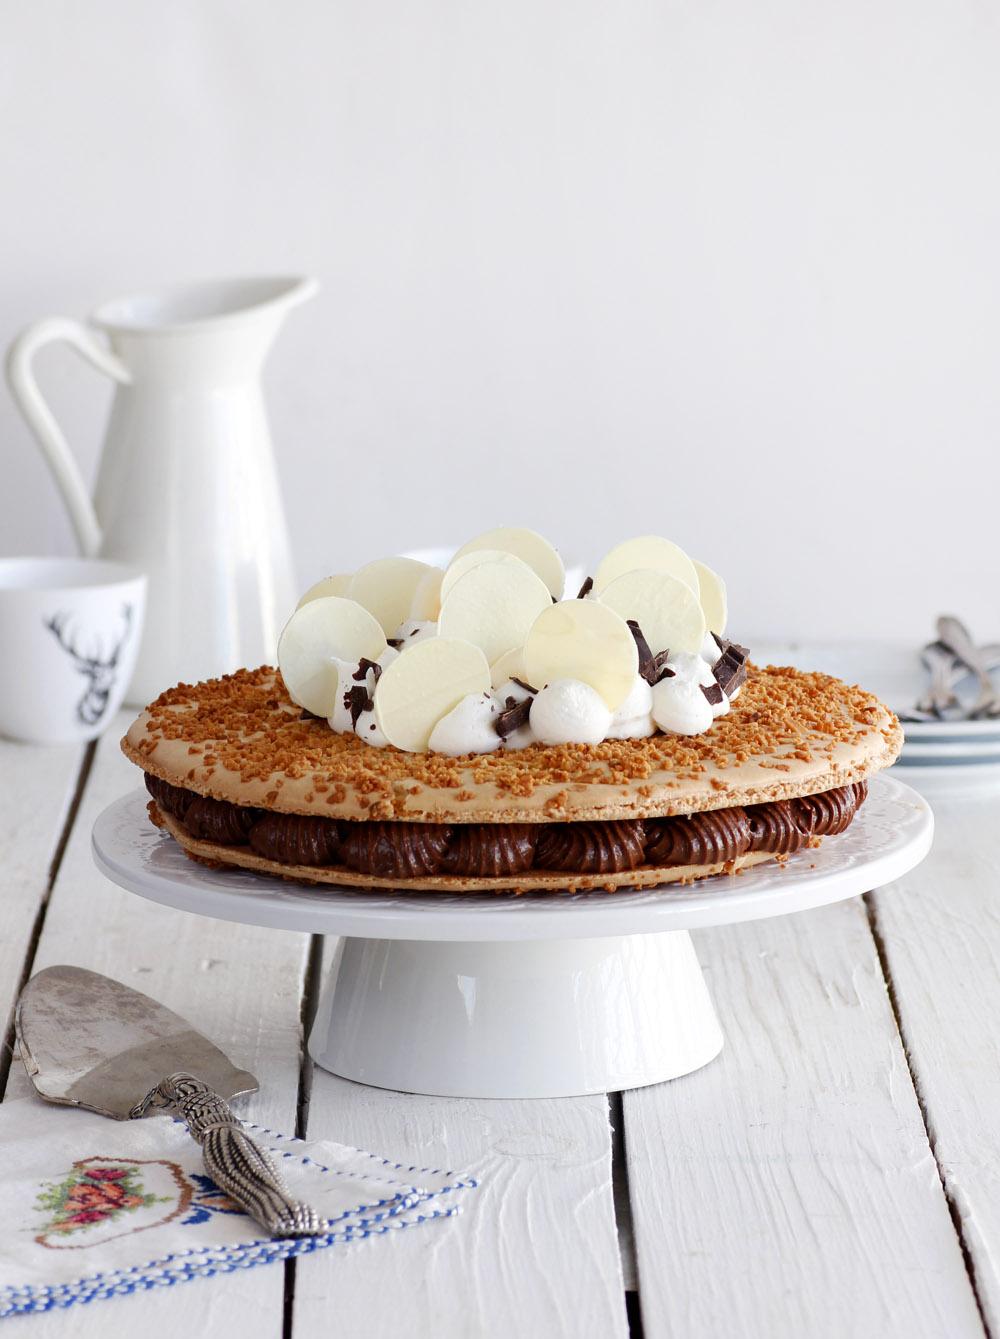 Coconut and Chocolate Macaroon Cake